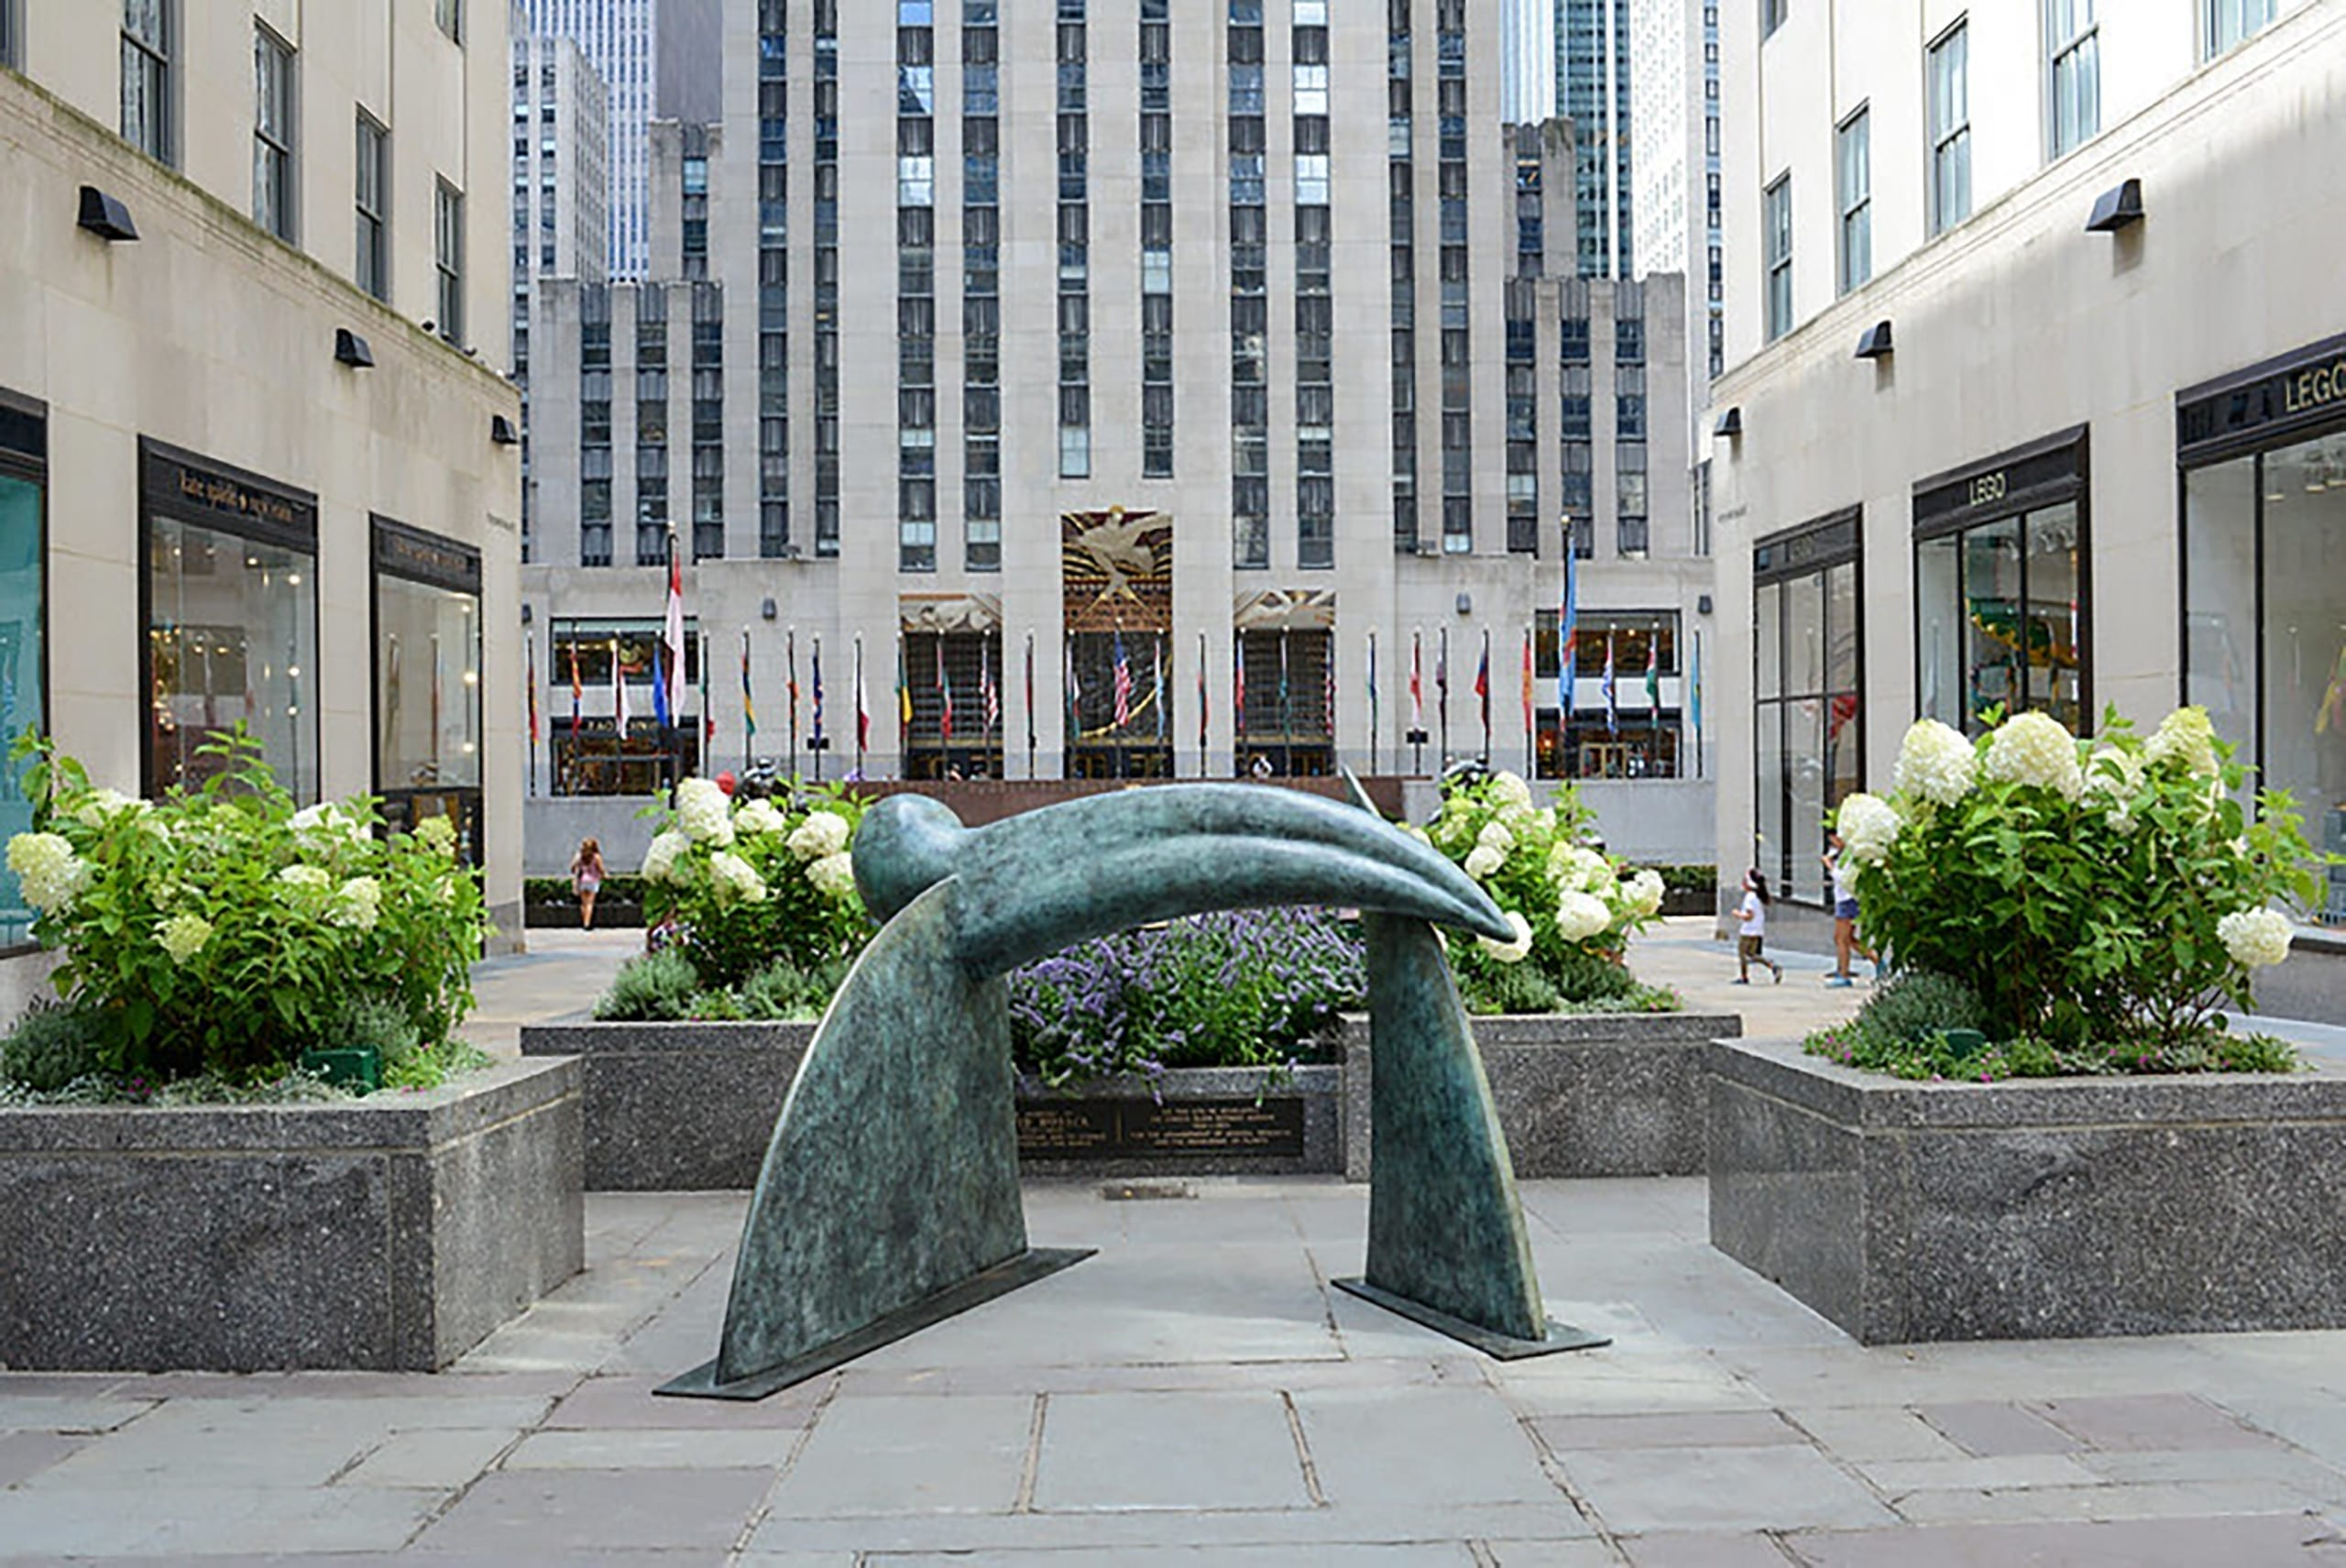 Inside Job, 2019. Bronze, 63 x 104 3/8 x 85 1/16 inches (160 x 265 x 216 cm). In Frieze Sculpture. Installation view, 2020. Rockefeller Center, New York. Photo: Casey Kelbaugh.